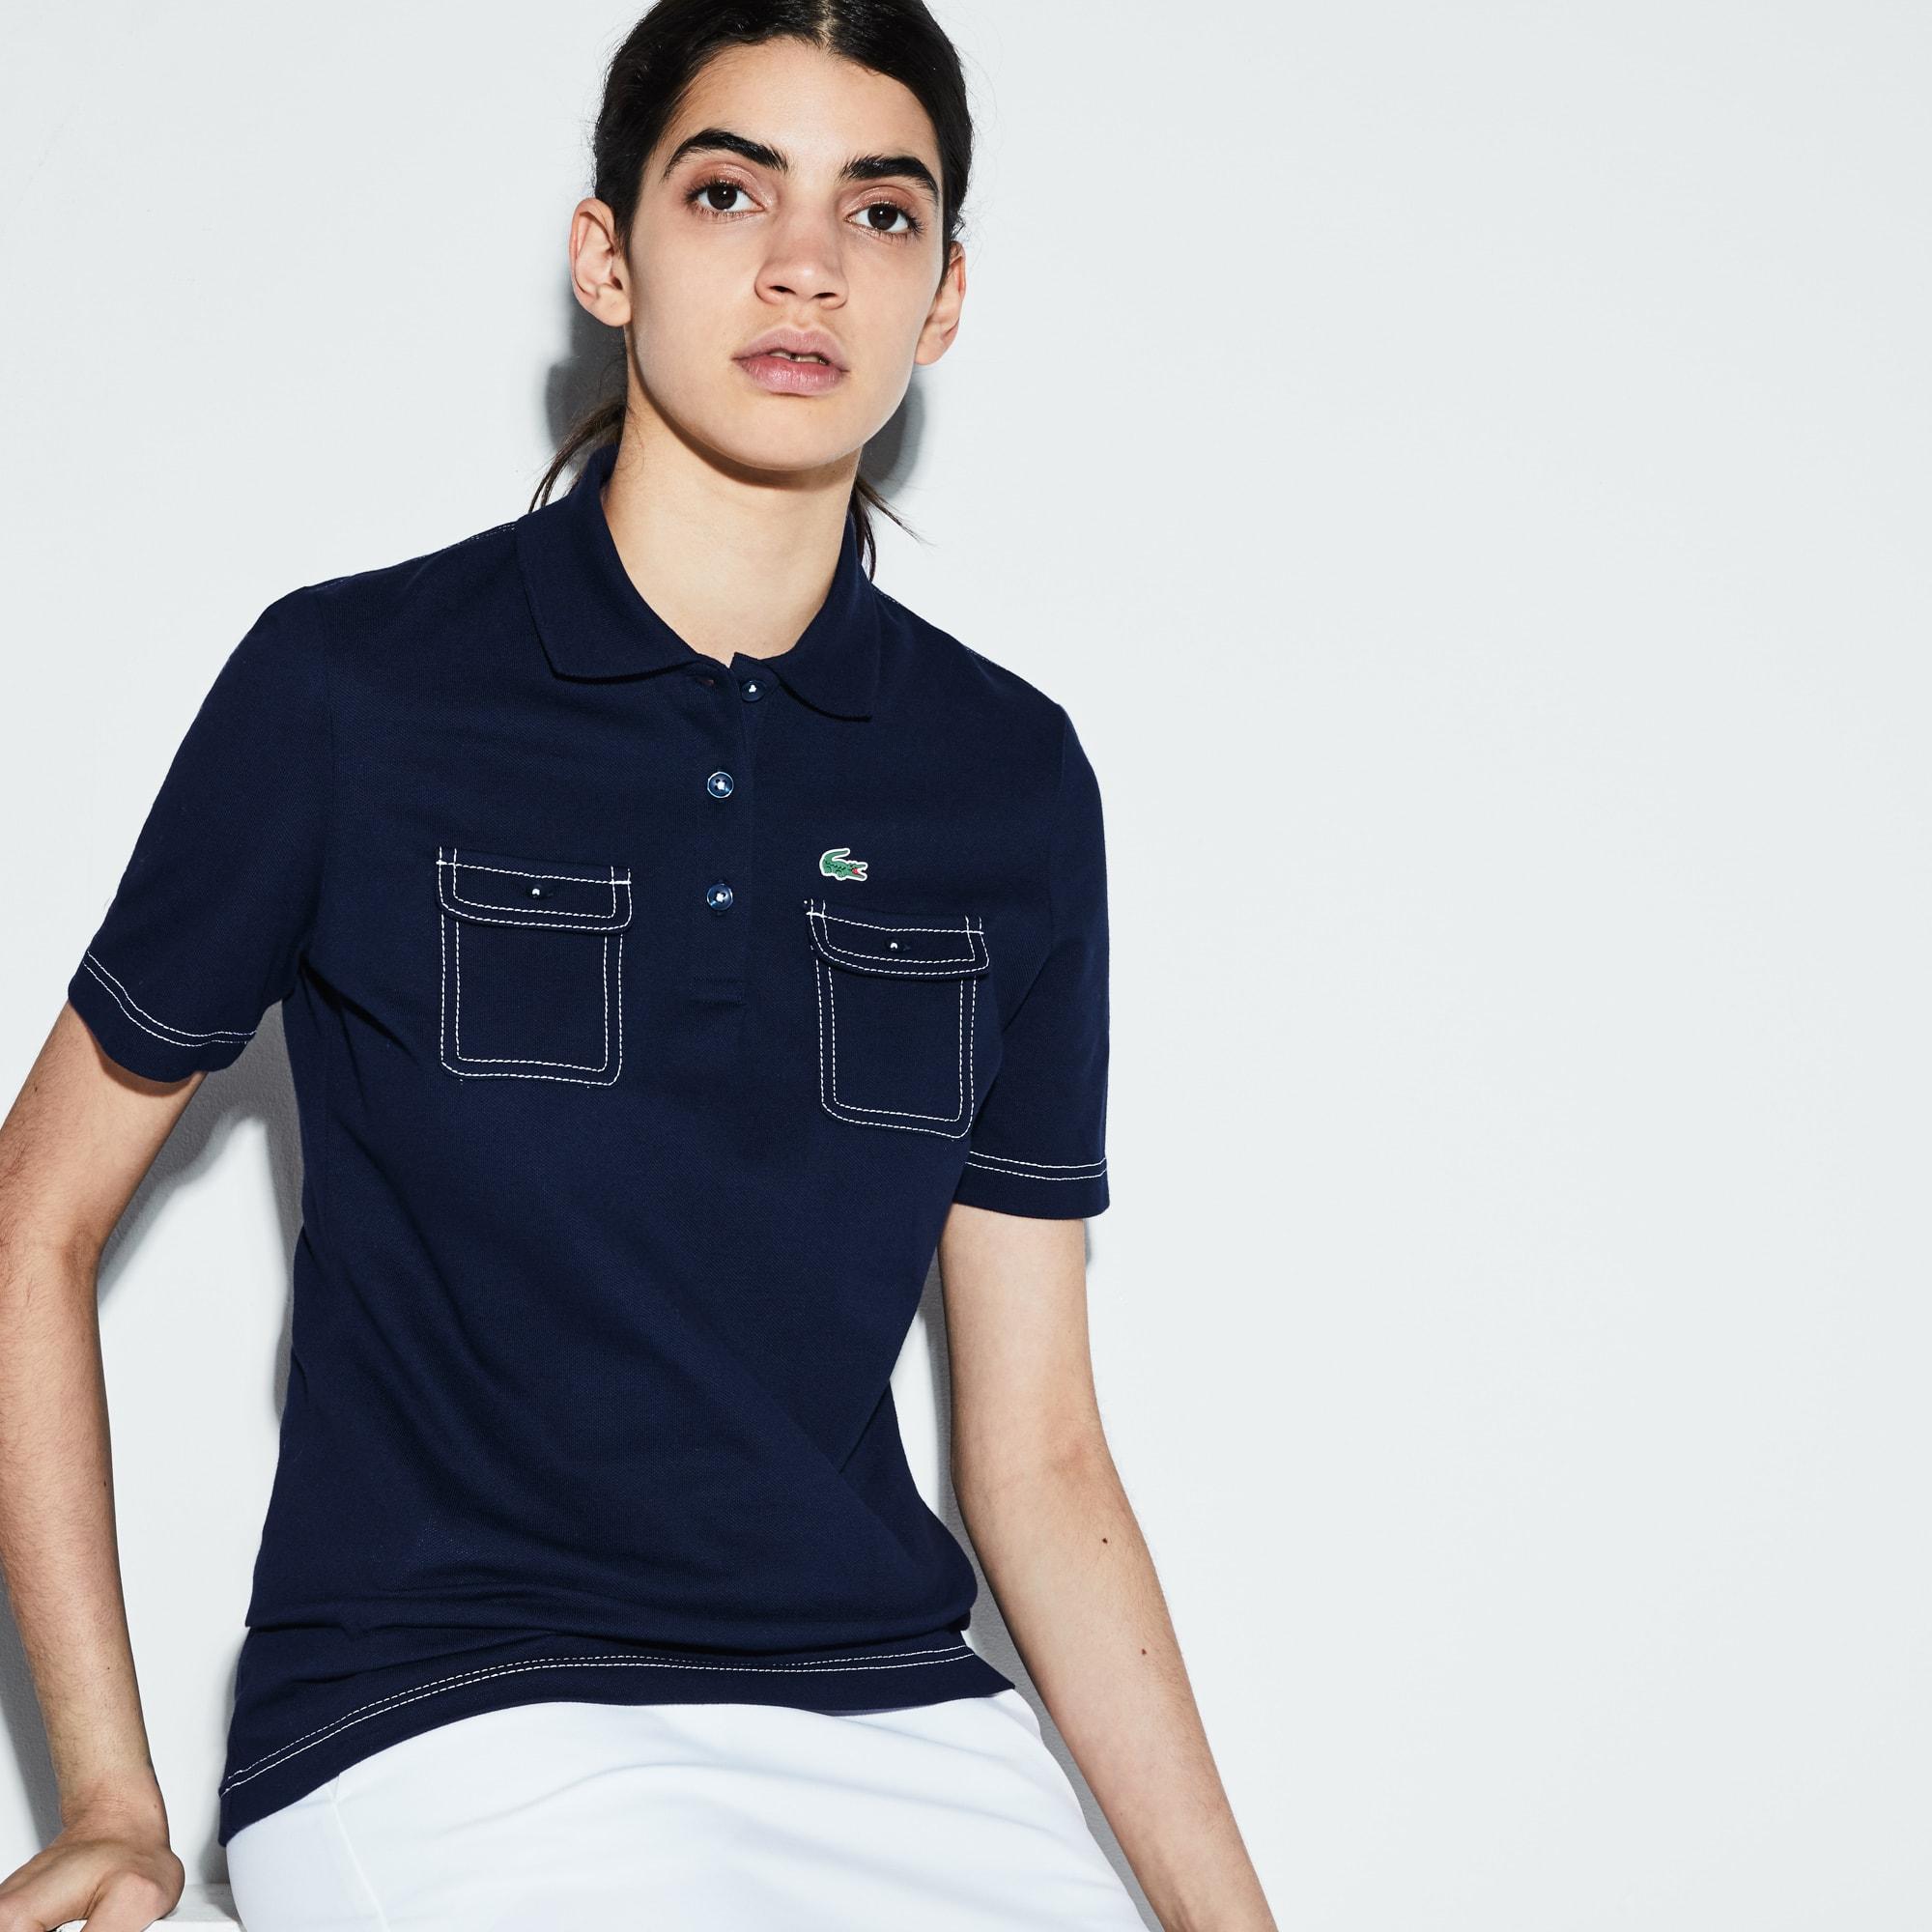 Women's Lacoste SPORT Golf Contrast Accent Stretch Mini Piqué Polo Shirt